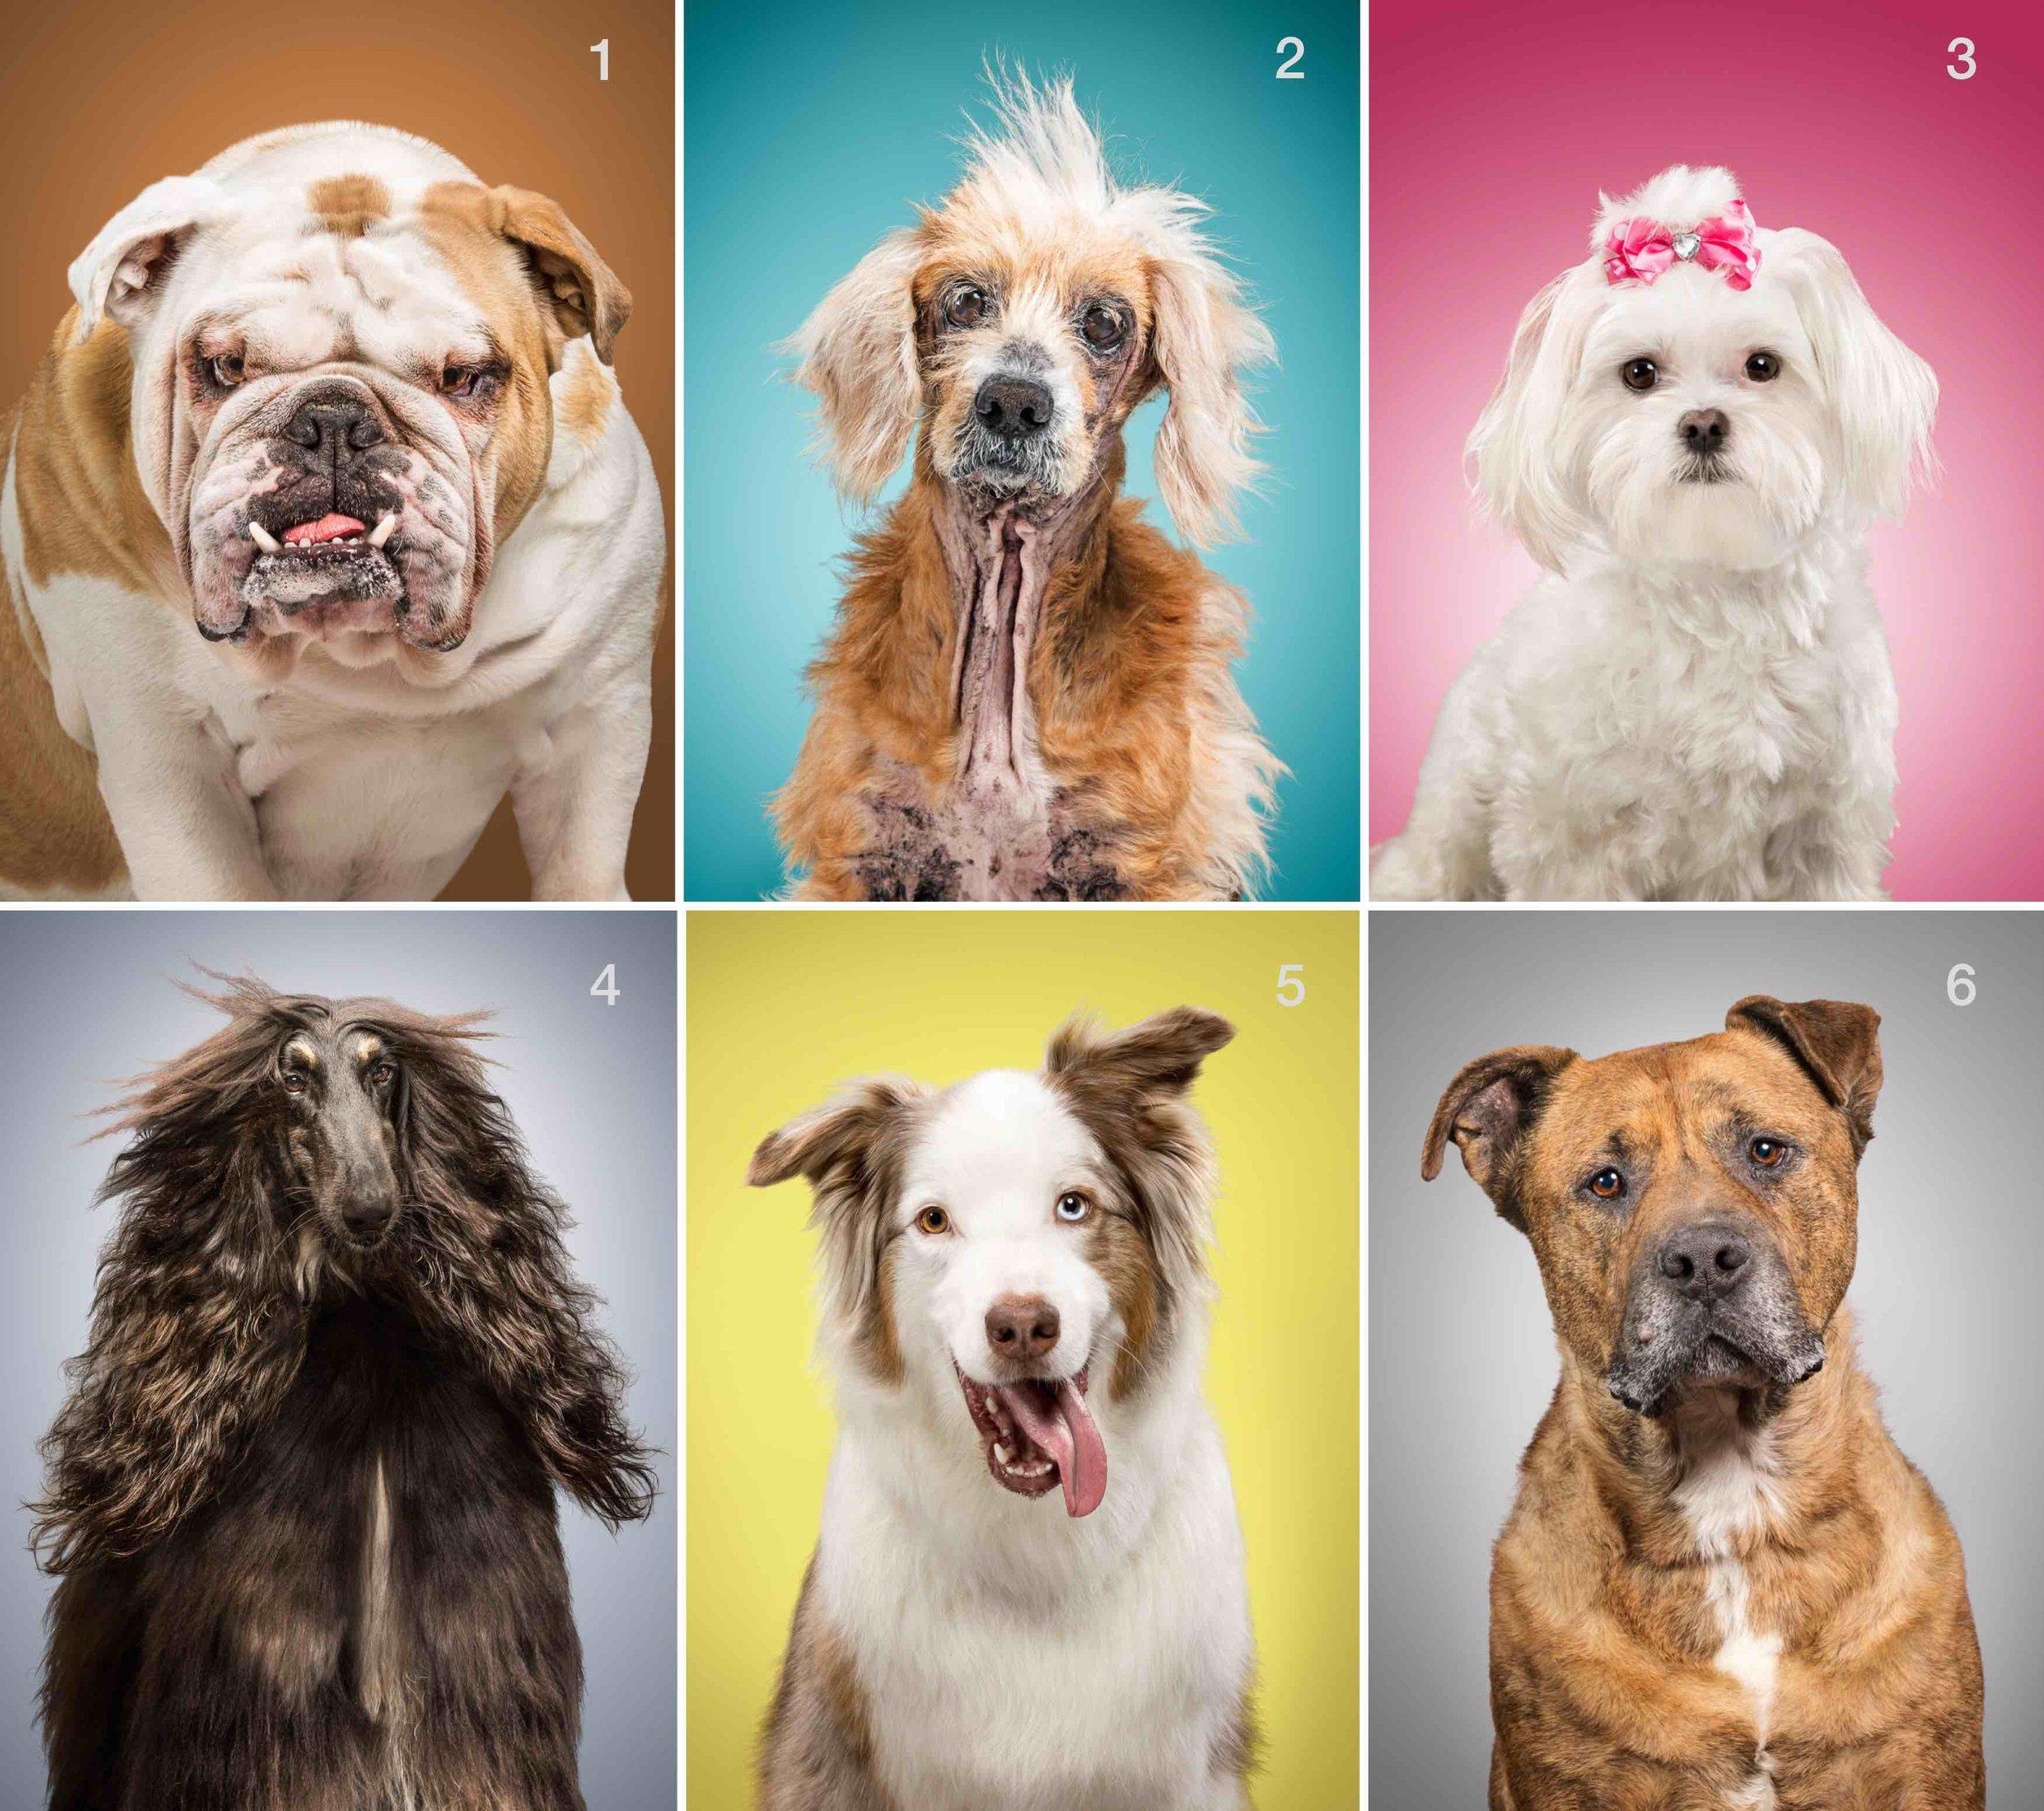 dog-portraits-collage-breeds-dog-photographer-alicia-rius